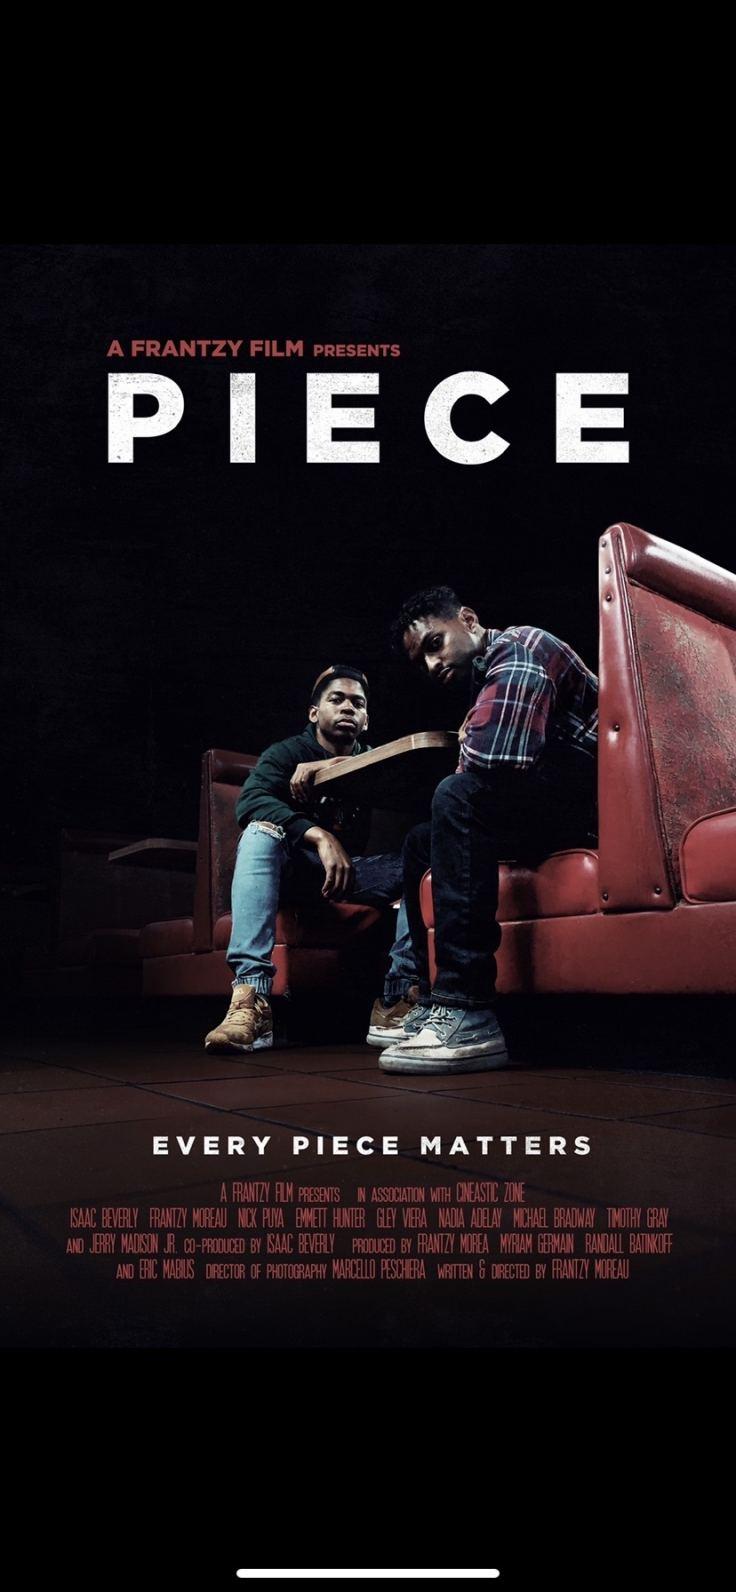 'Piece,' A Frantzy Film